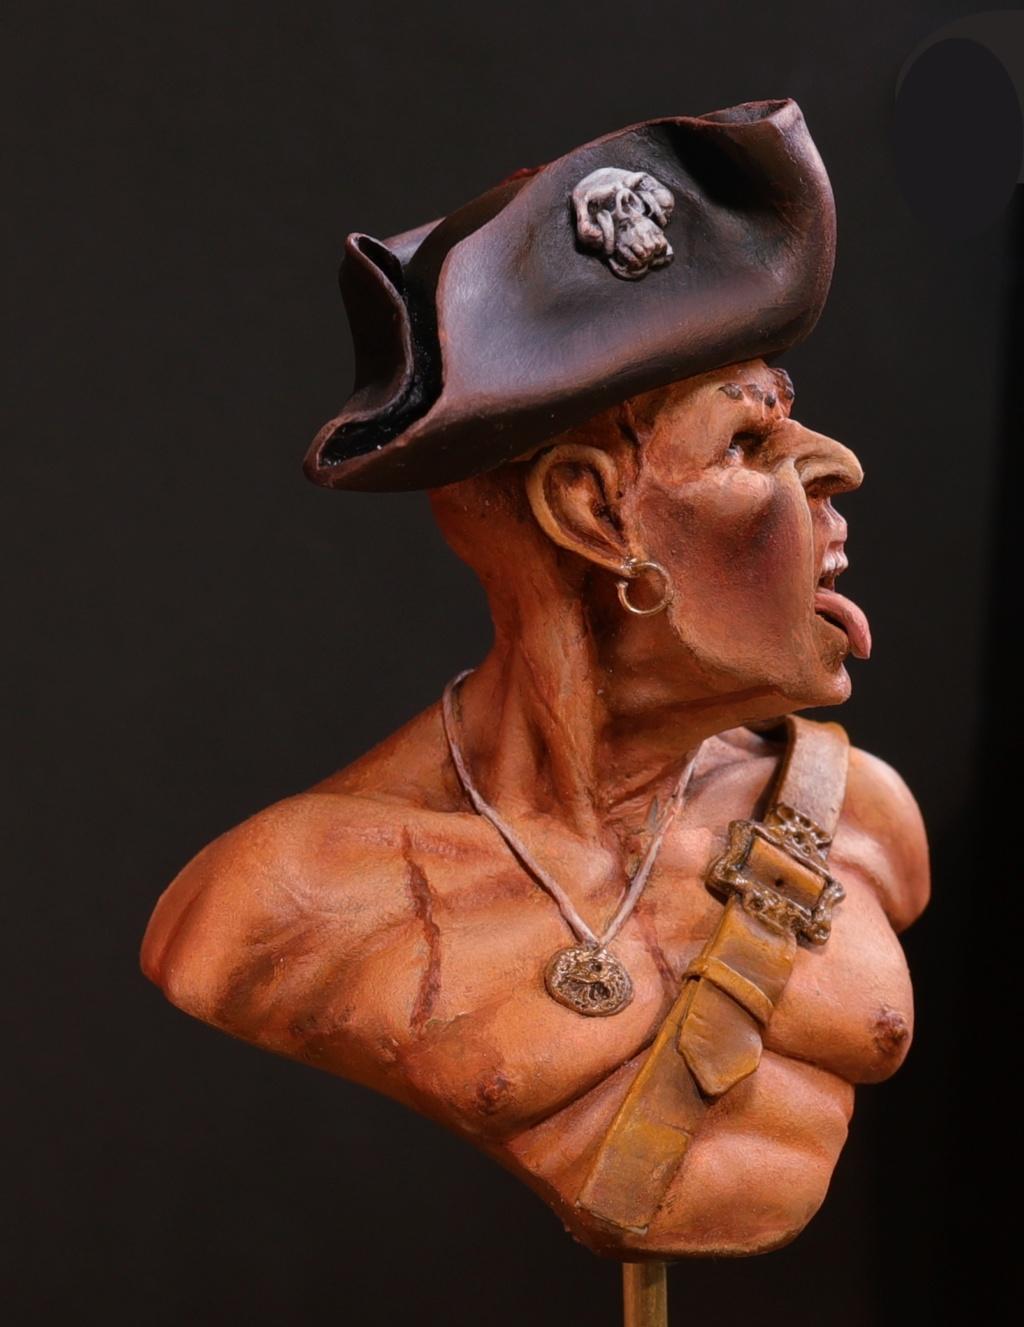 Pirate des caraïbes - Définitif Pirate21